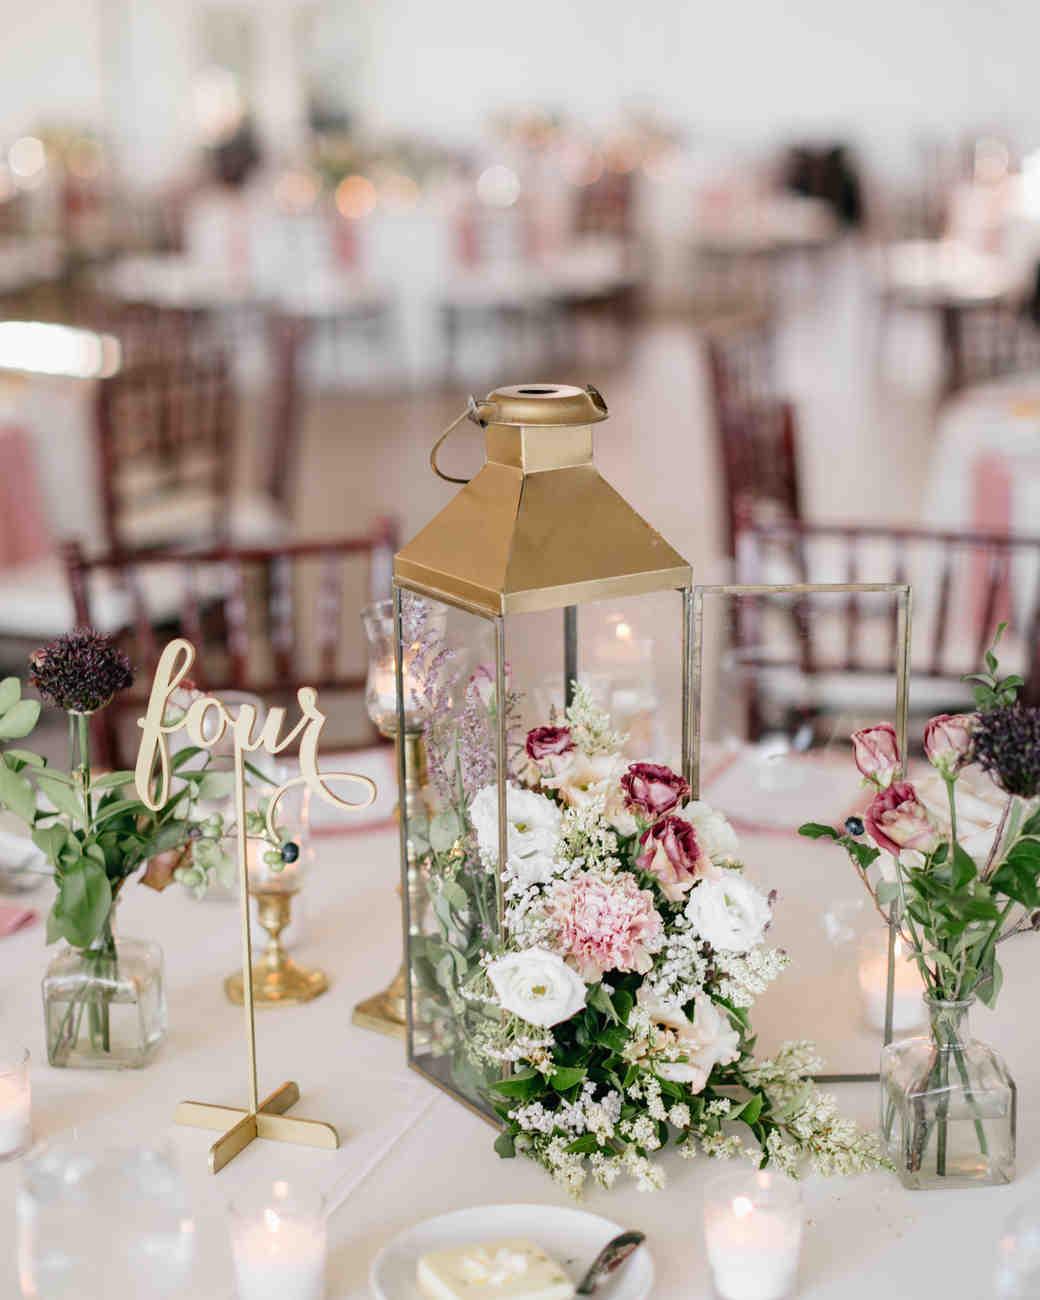 30 rose centerpieces that will upgrade your reception tables rh marthastewartweddings com